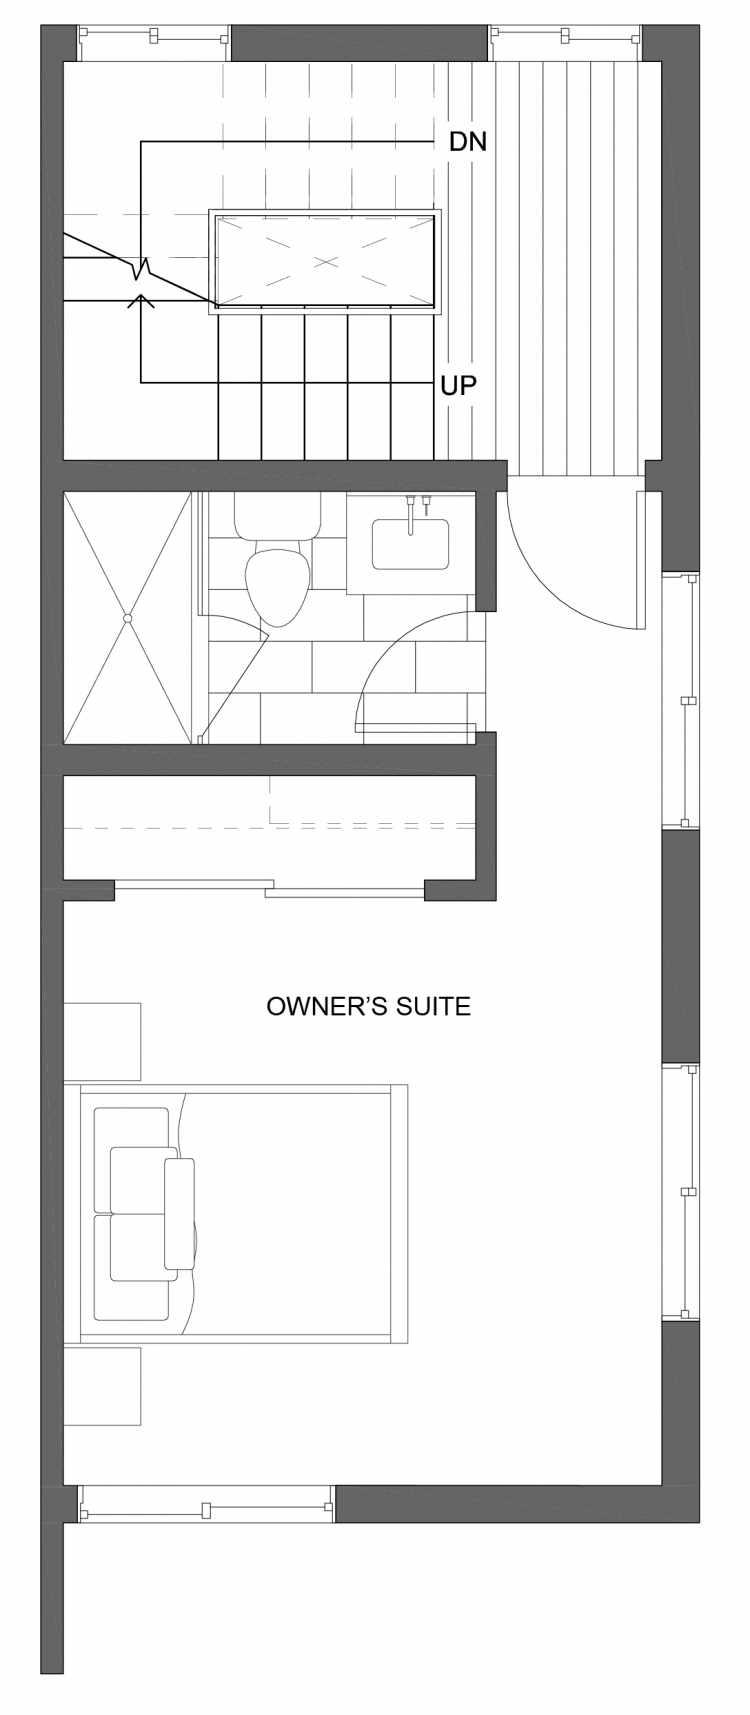 Third Floor Plan of 10429H Alderbrook Pl NW, One of the Jasmine Townhomes in the Greenwood Neighborhood of Seattle